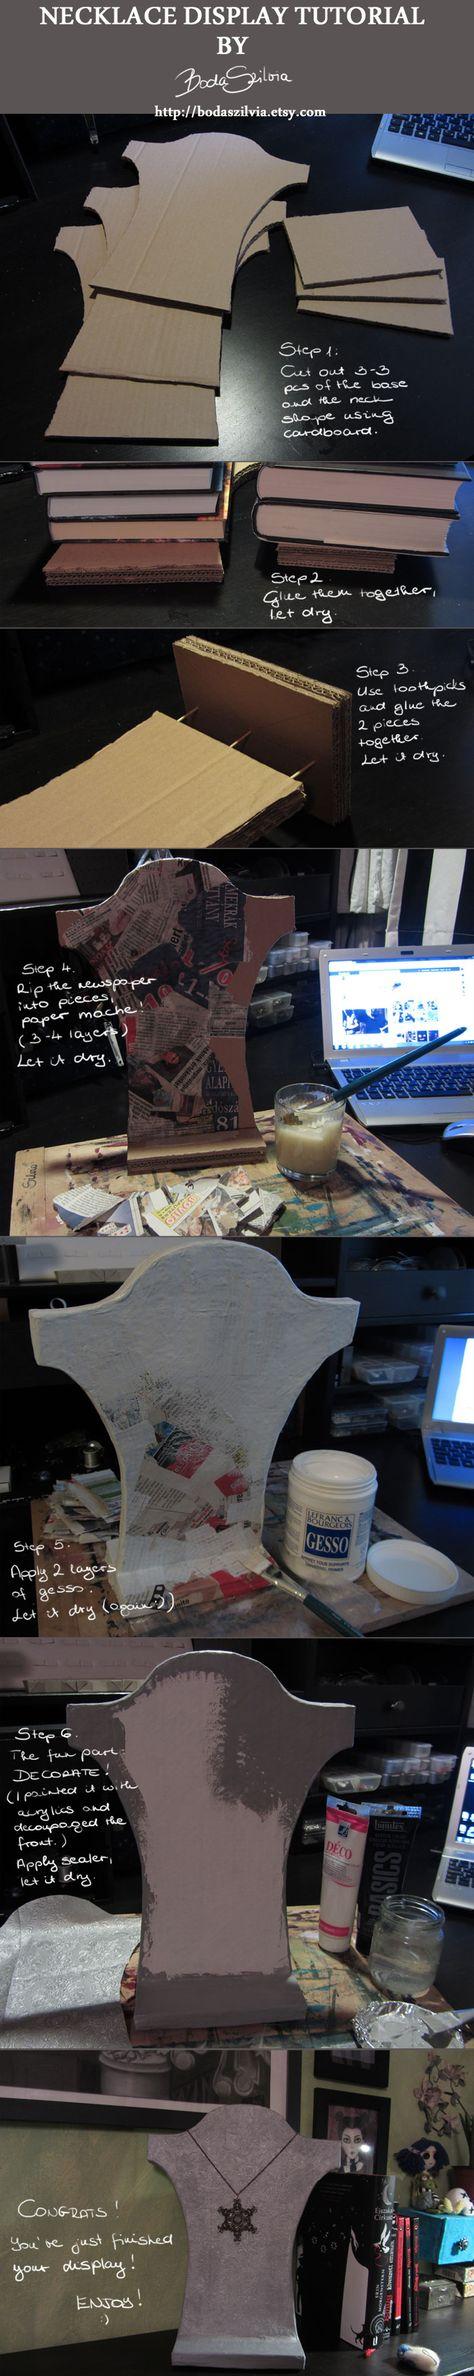 Necklace display tutorial by bodaszilvia.deviantart.com    (home made paper mache glue recipe included in the description :) )